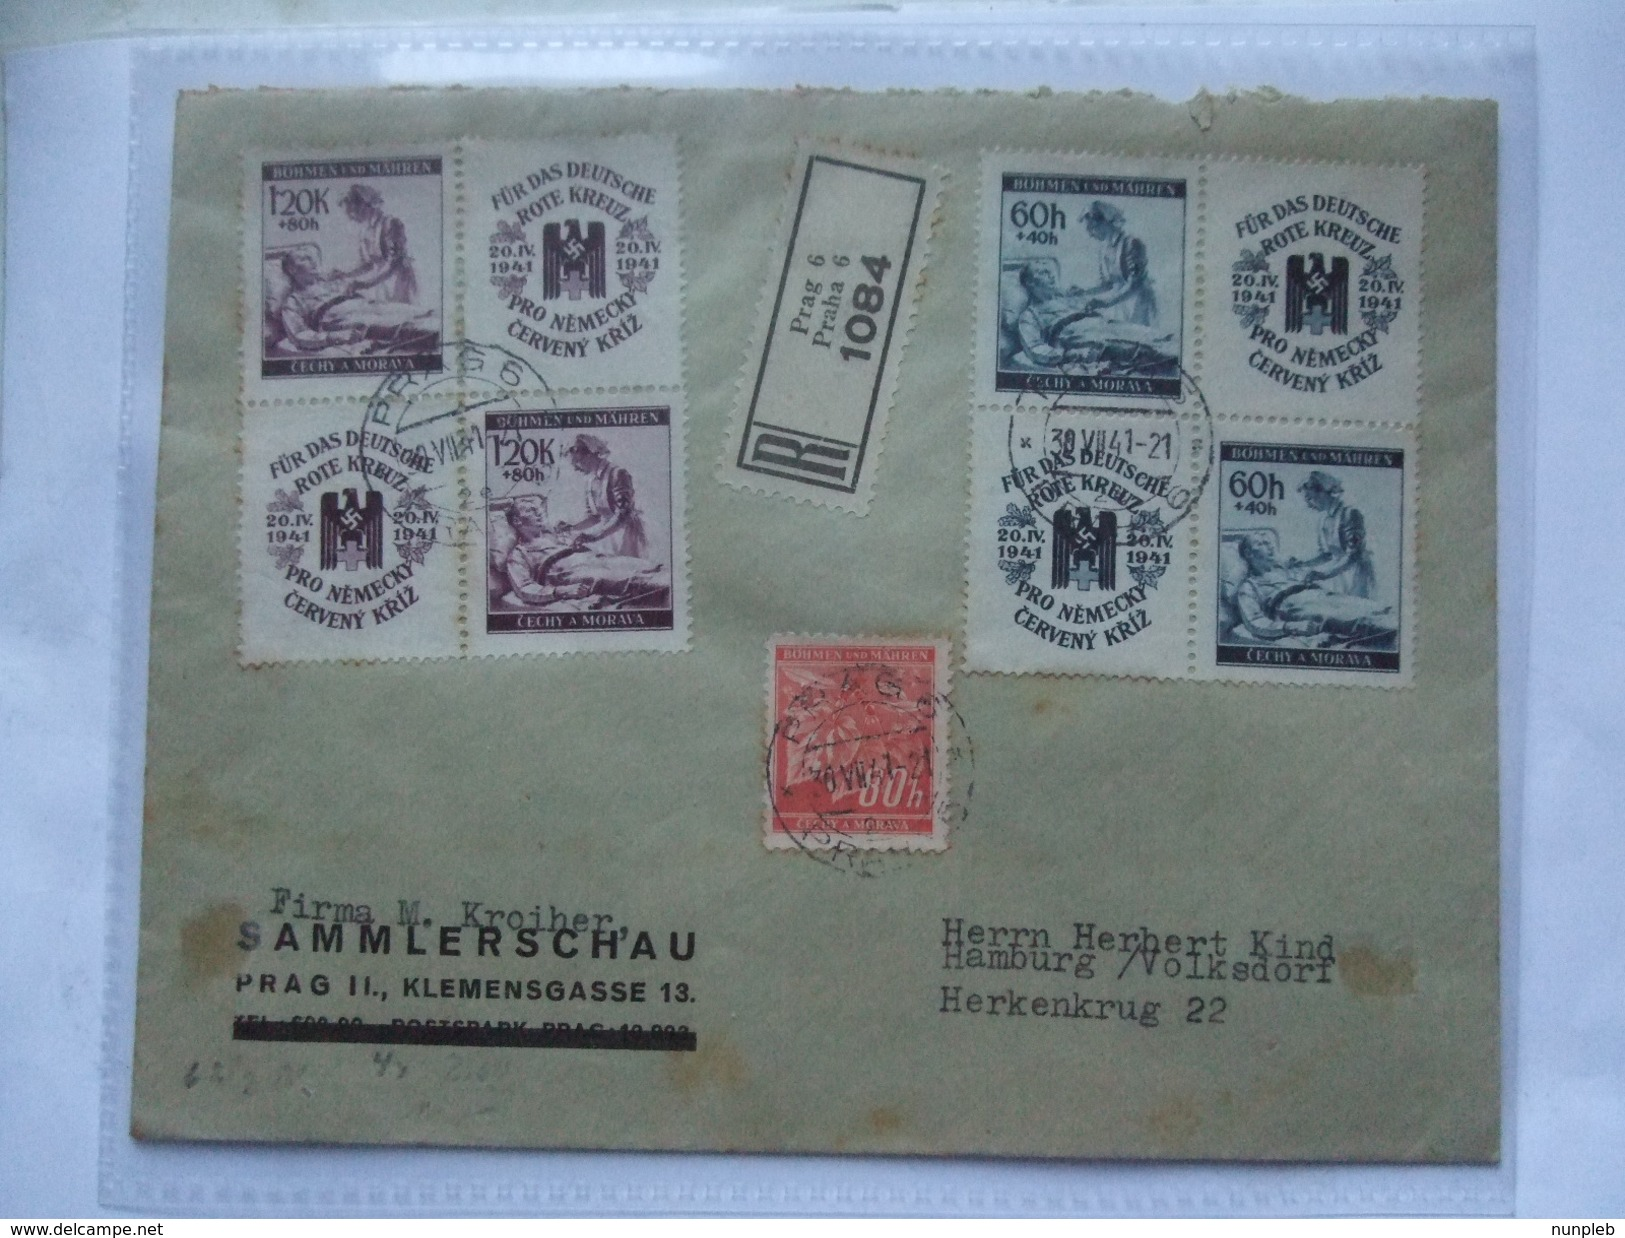 BOHEMIA & MORAVIA / Bohmen Und Mahren Registered Praha Cover Sent To Herkenkrug Germany - Bohemia & Moravia